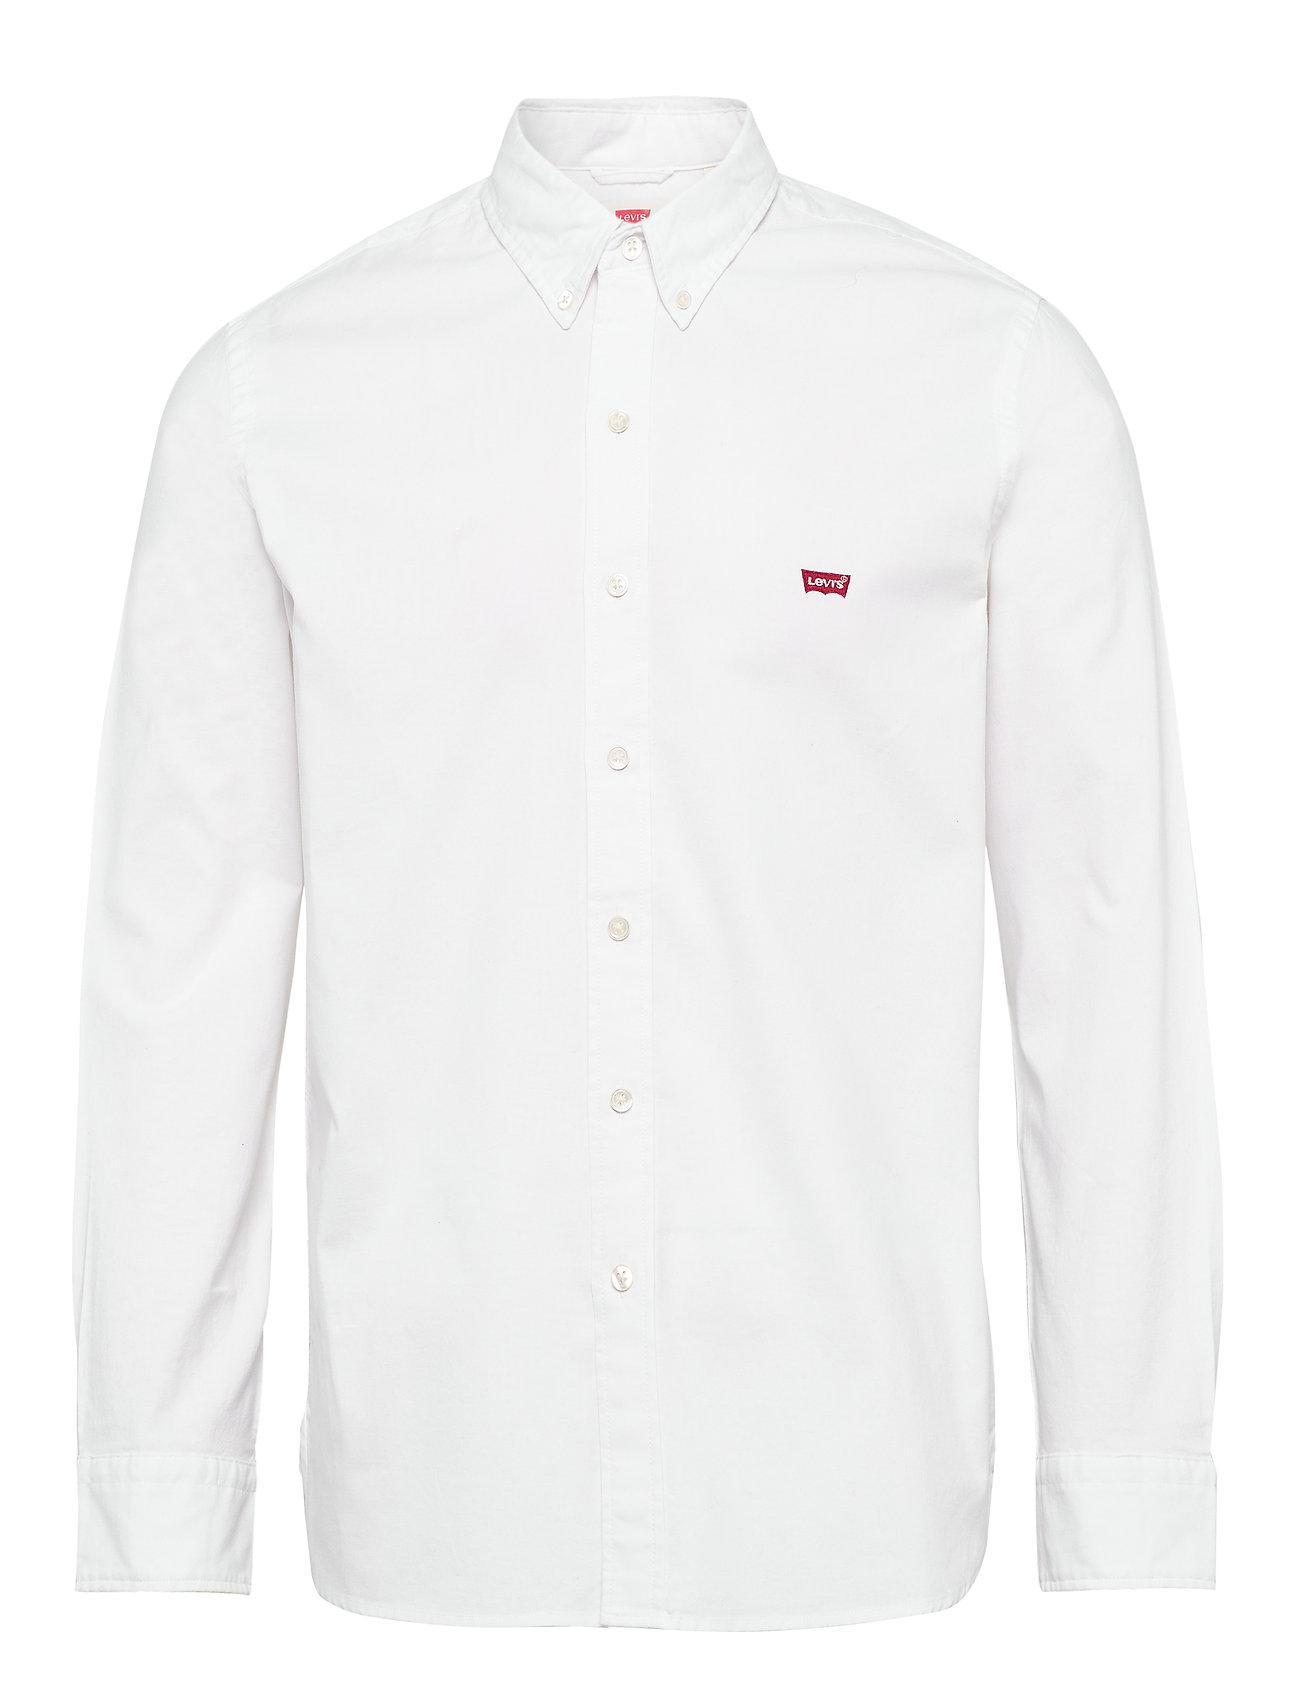 Hm Men Ls WhiteneutralsLevi´s Battery Shirt dtChrxsQB